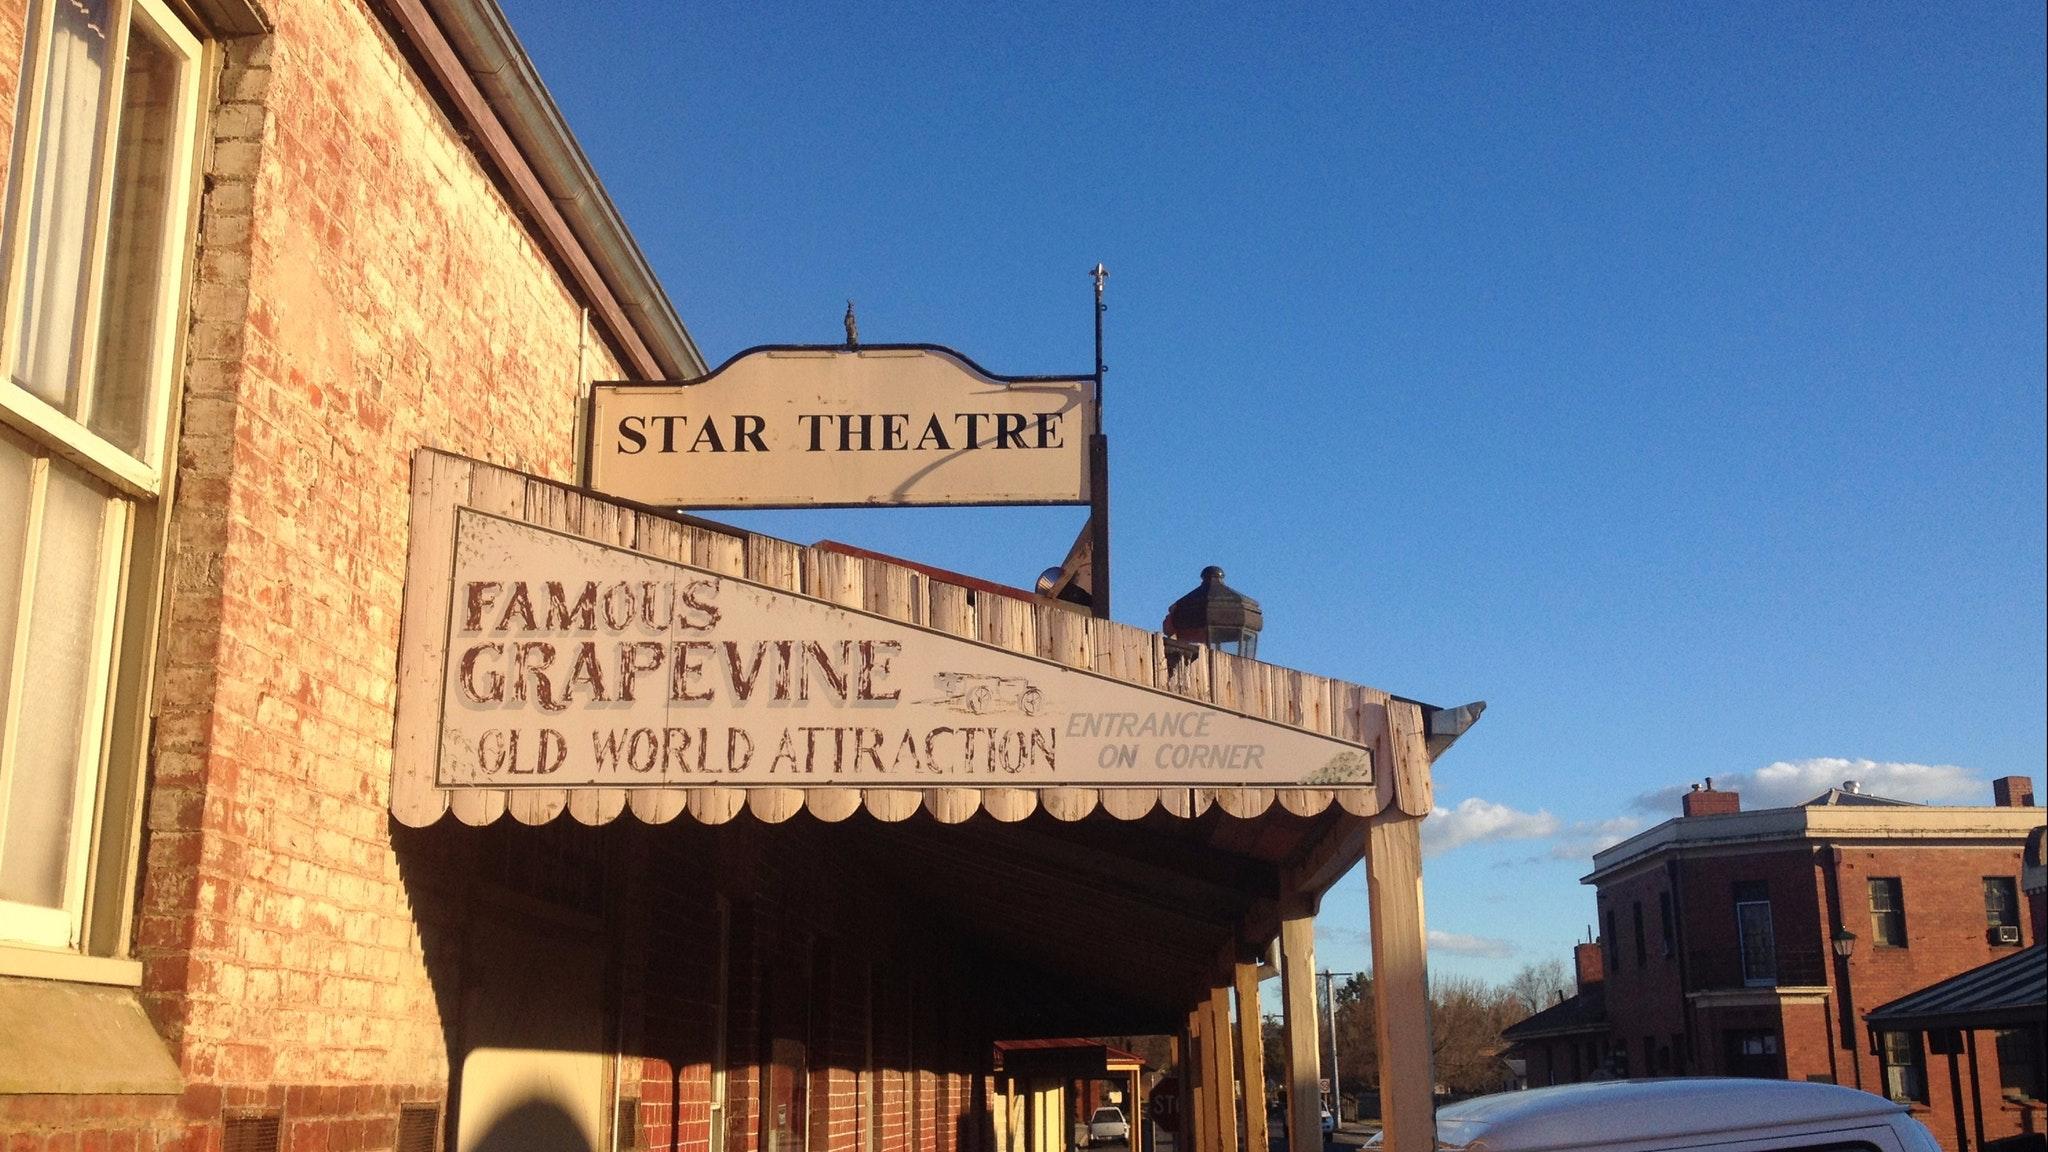 Star Theatre Chiltern